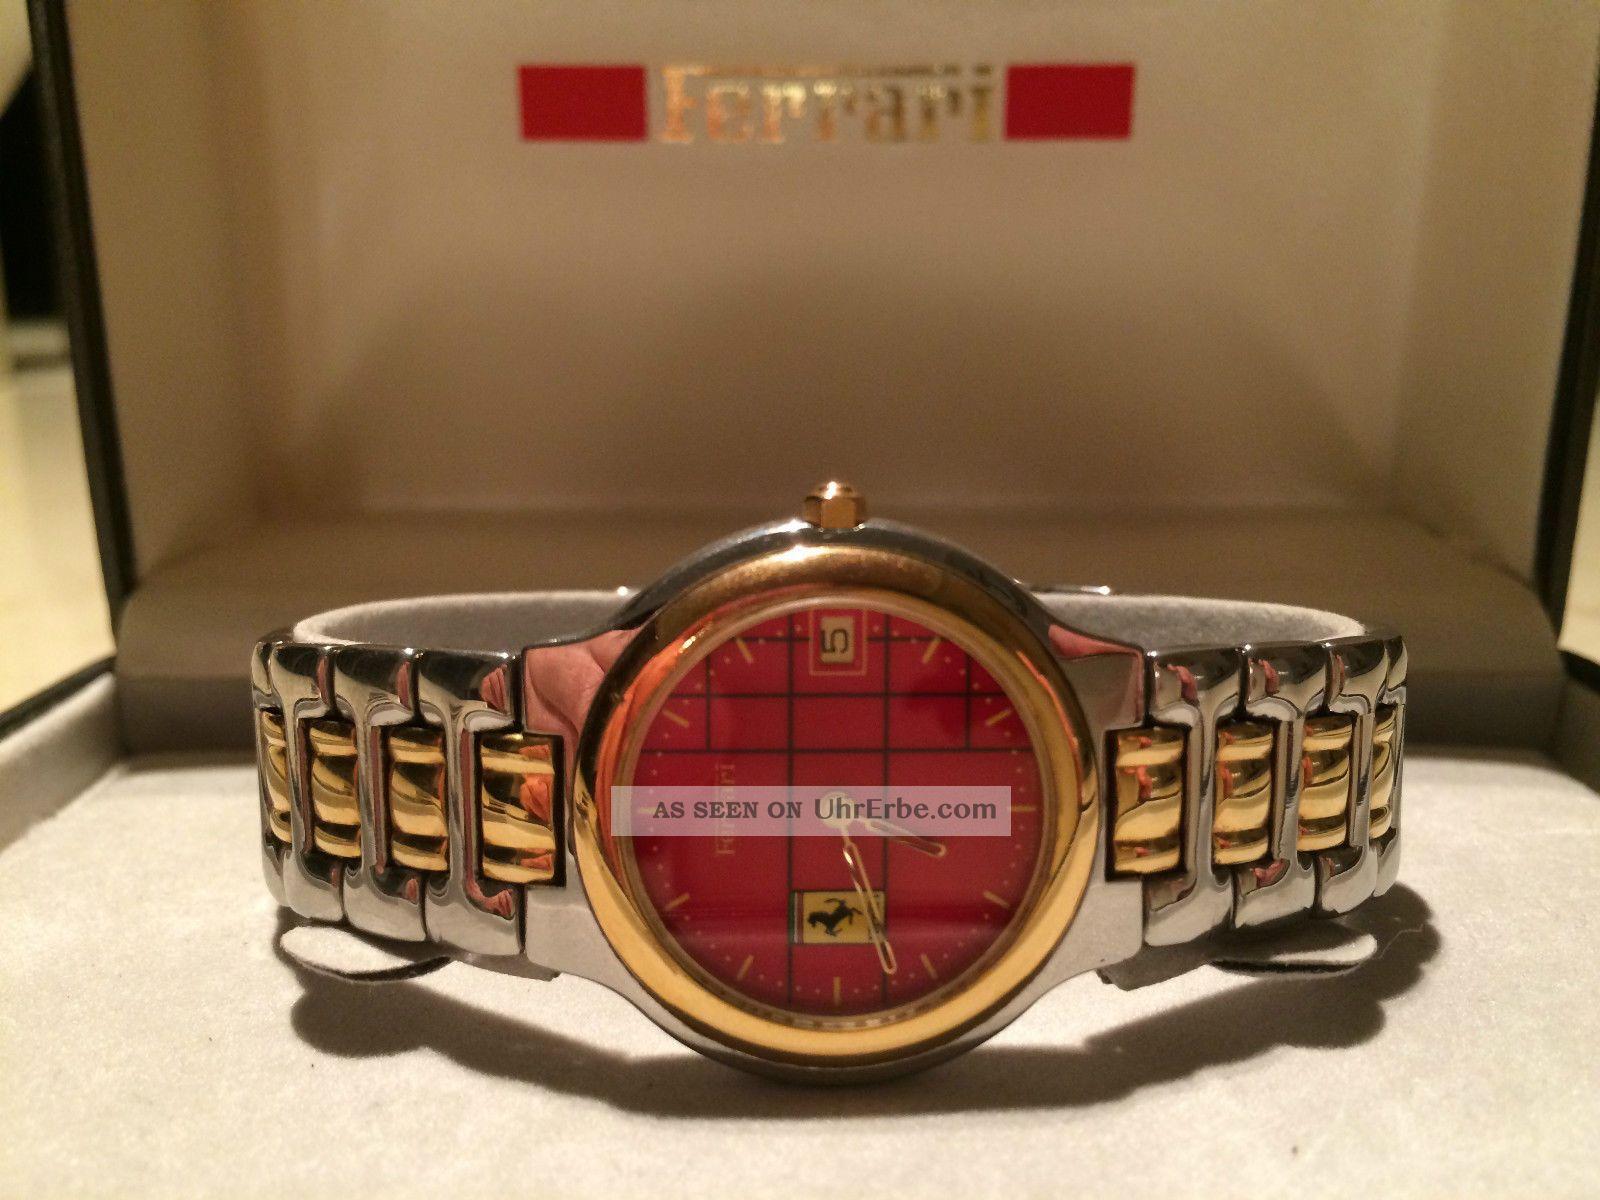 Ferrari Cartier Nr.  294774 Formula Damenuhr Wie,  Seltene Sammleruhr Armbanduhren Bild